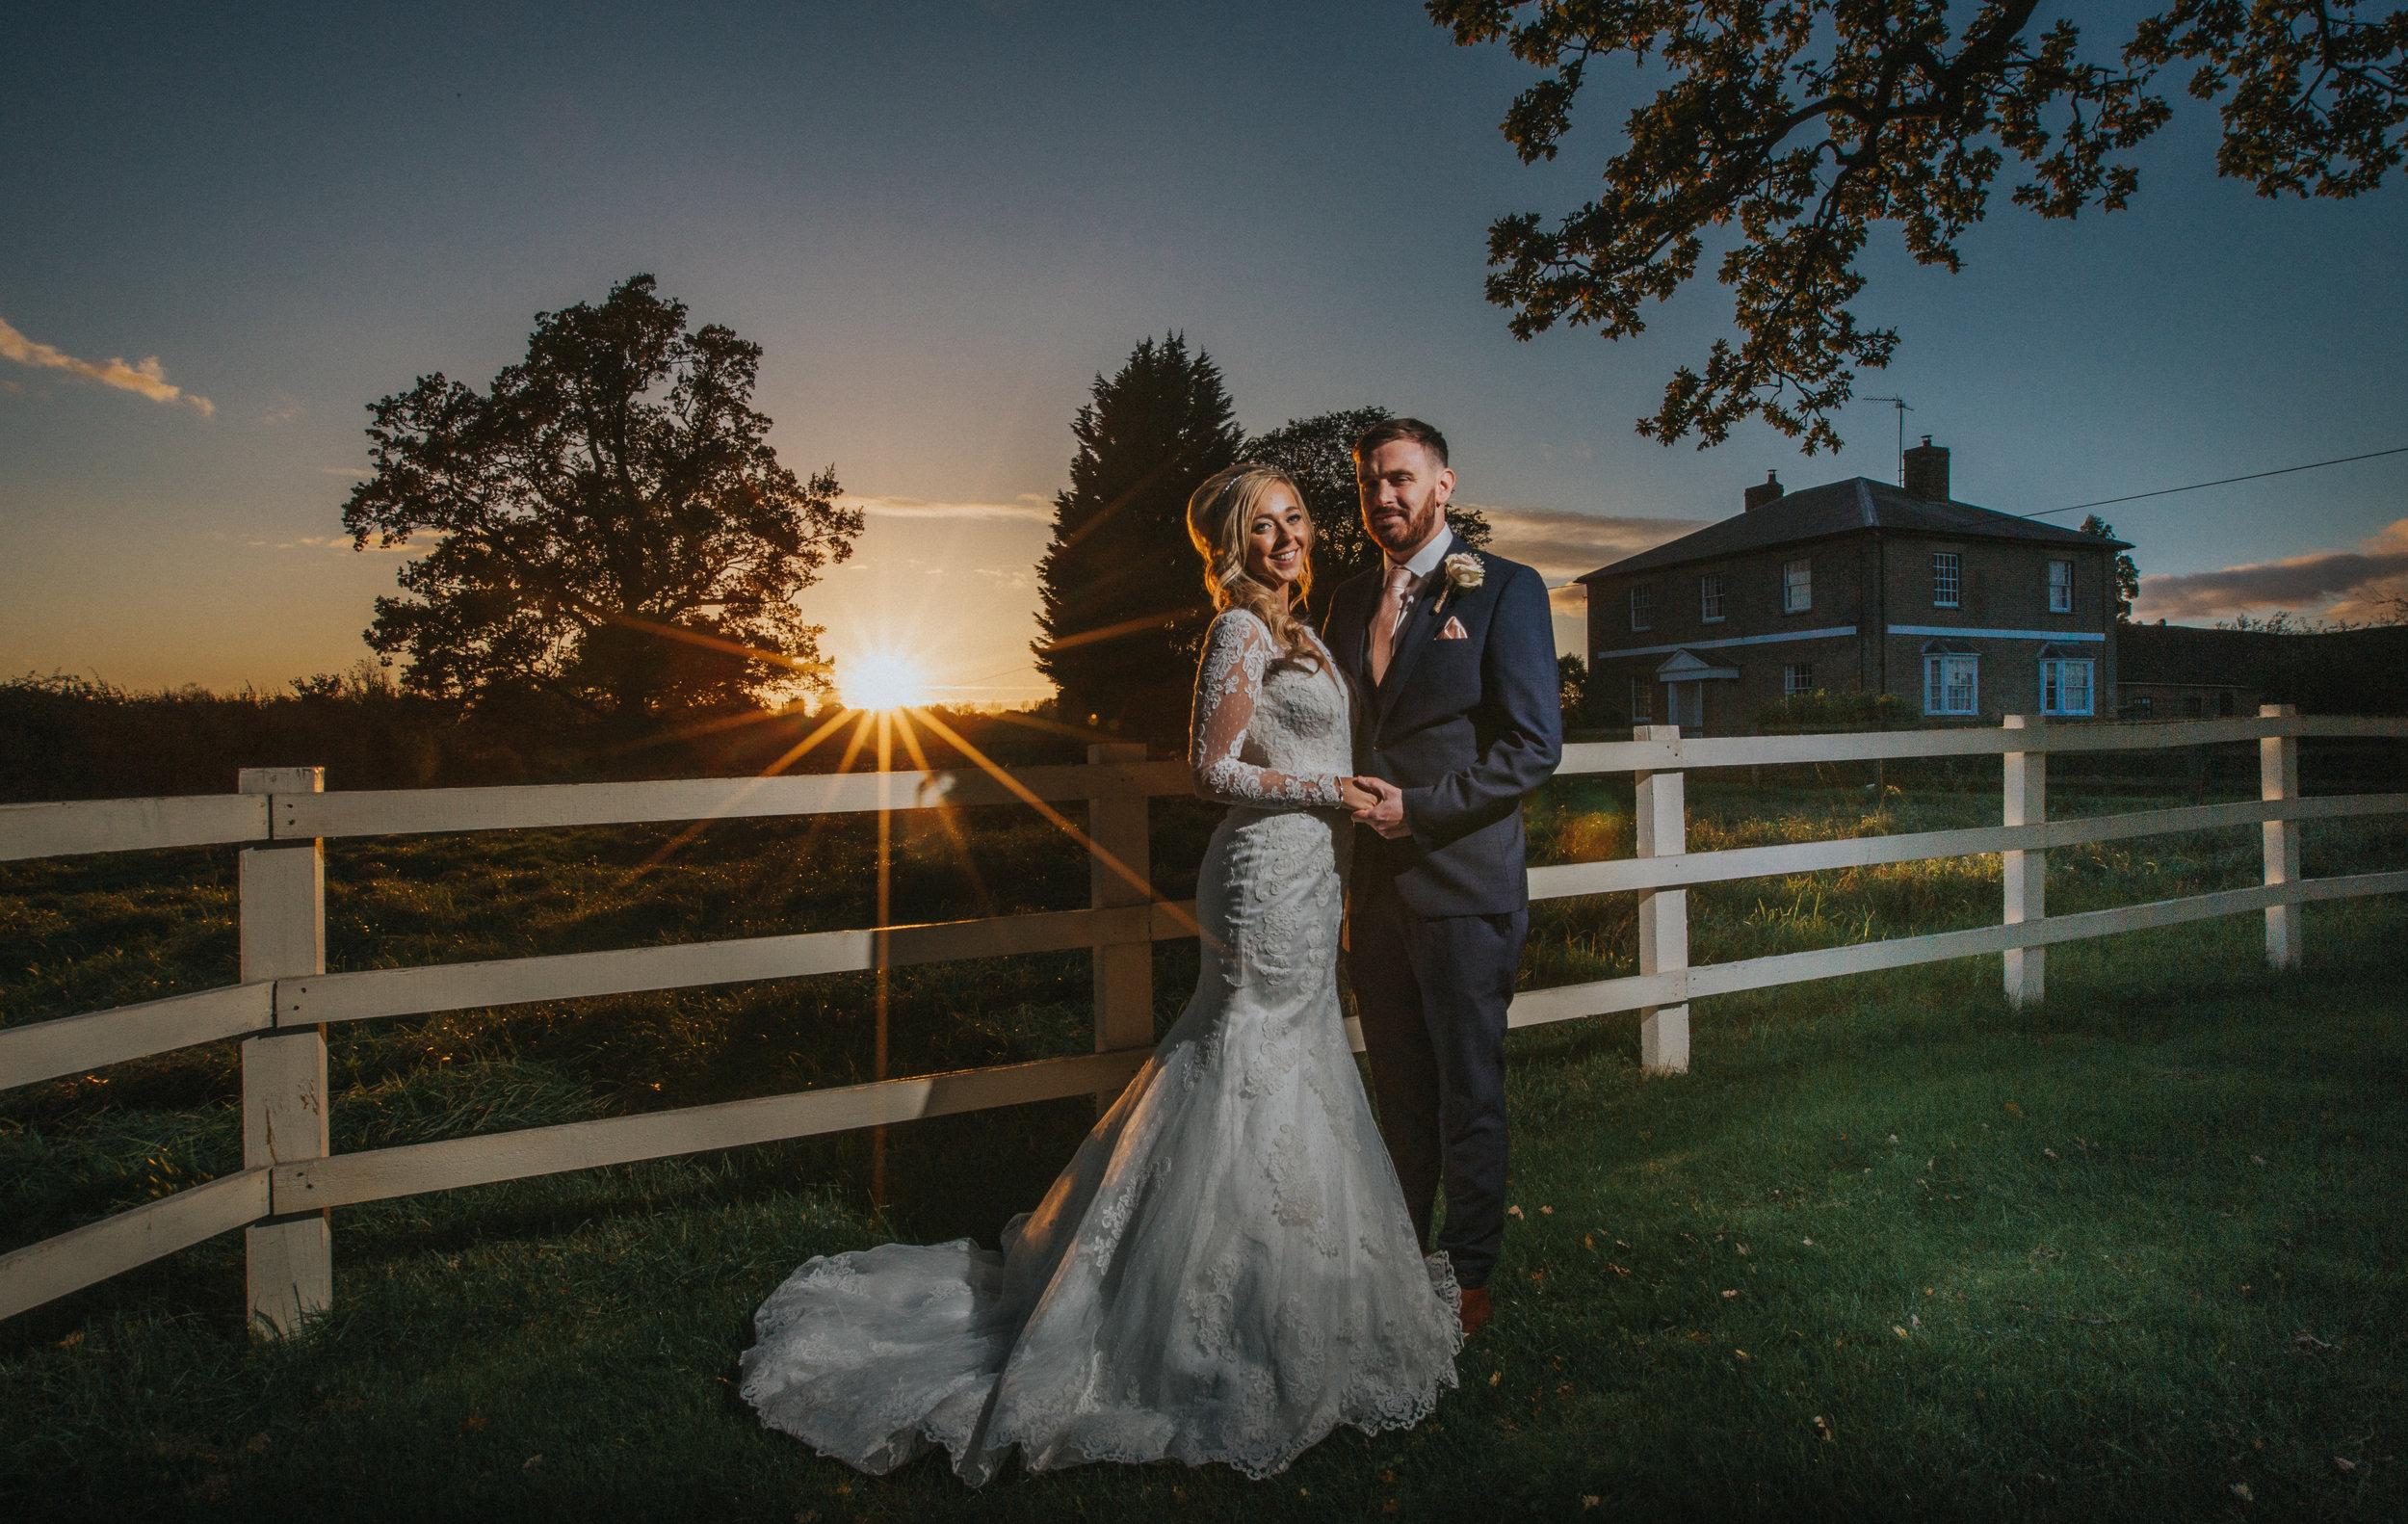 london-hertfordshire-wedding-photography-milling-barn-portrait-61